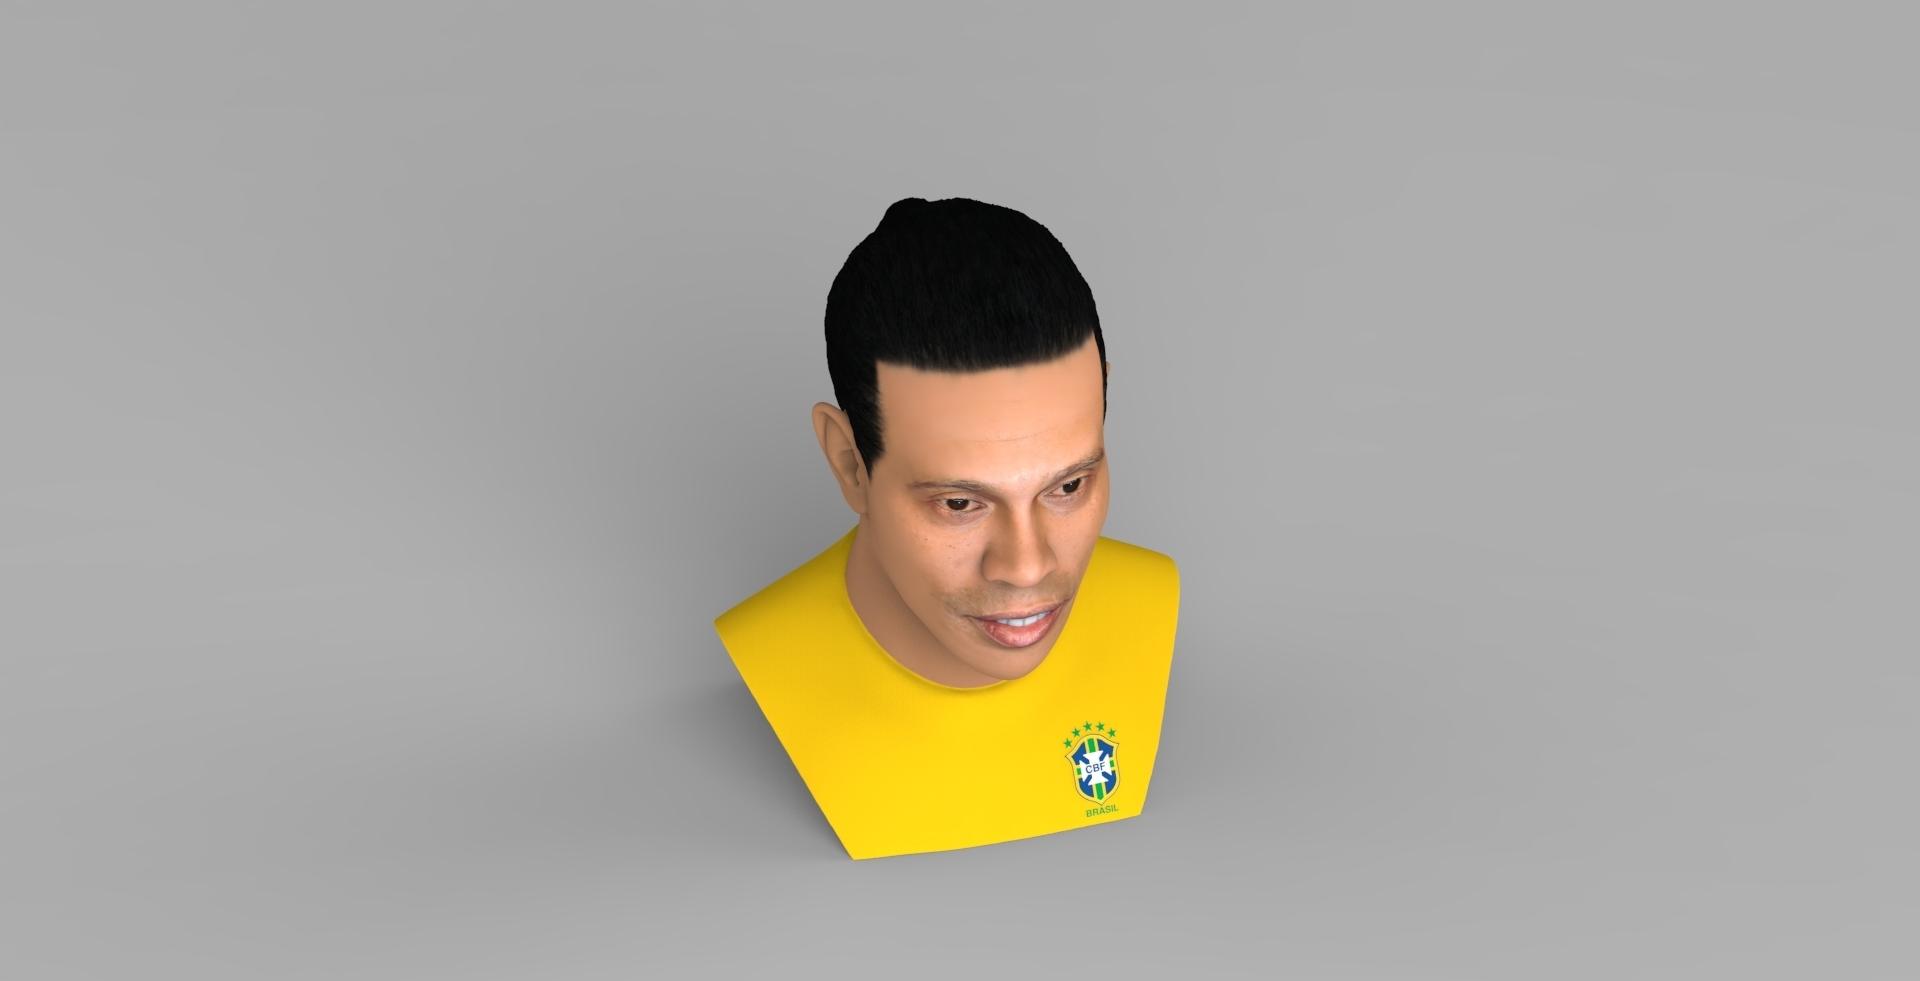 untitled.1686.jpg Download STL file Ronaldinho bust ready for full color 3D printing • 3D print model, PrintedReality